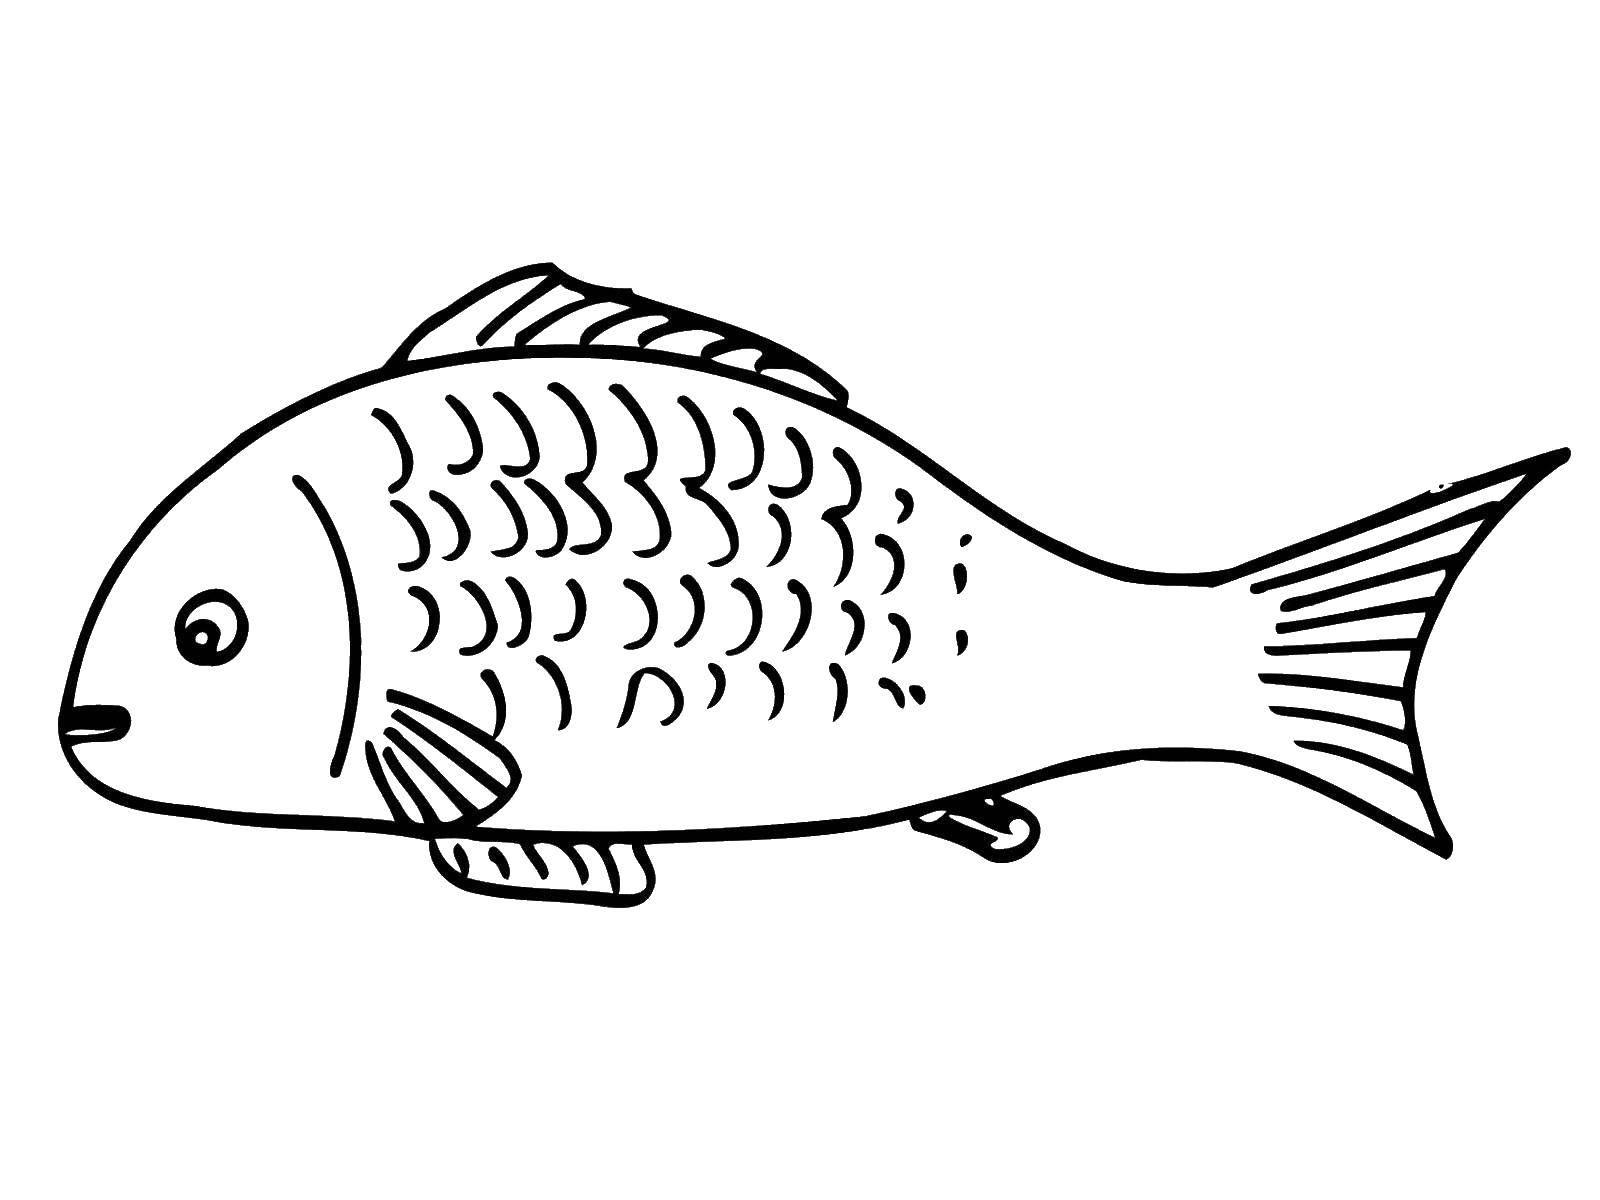 Coloring sheet fish Download ,Princess Cadance, Shining Armor,.  Print